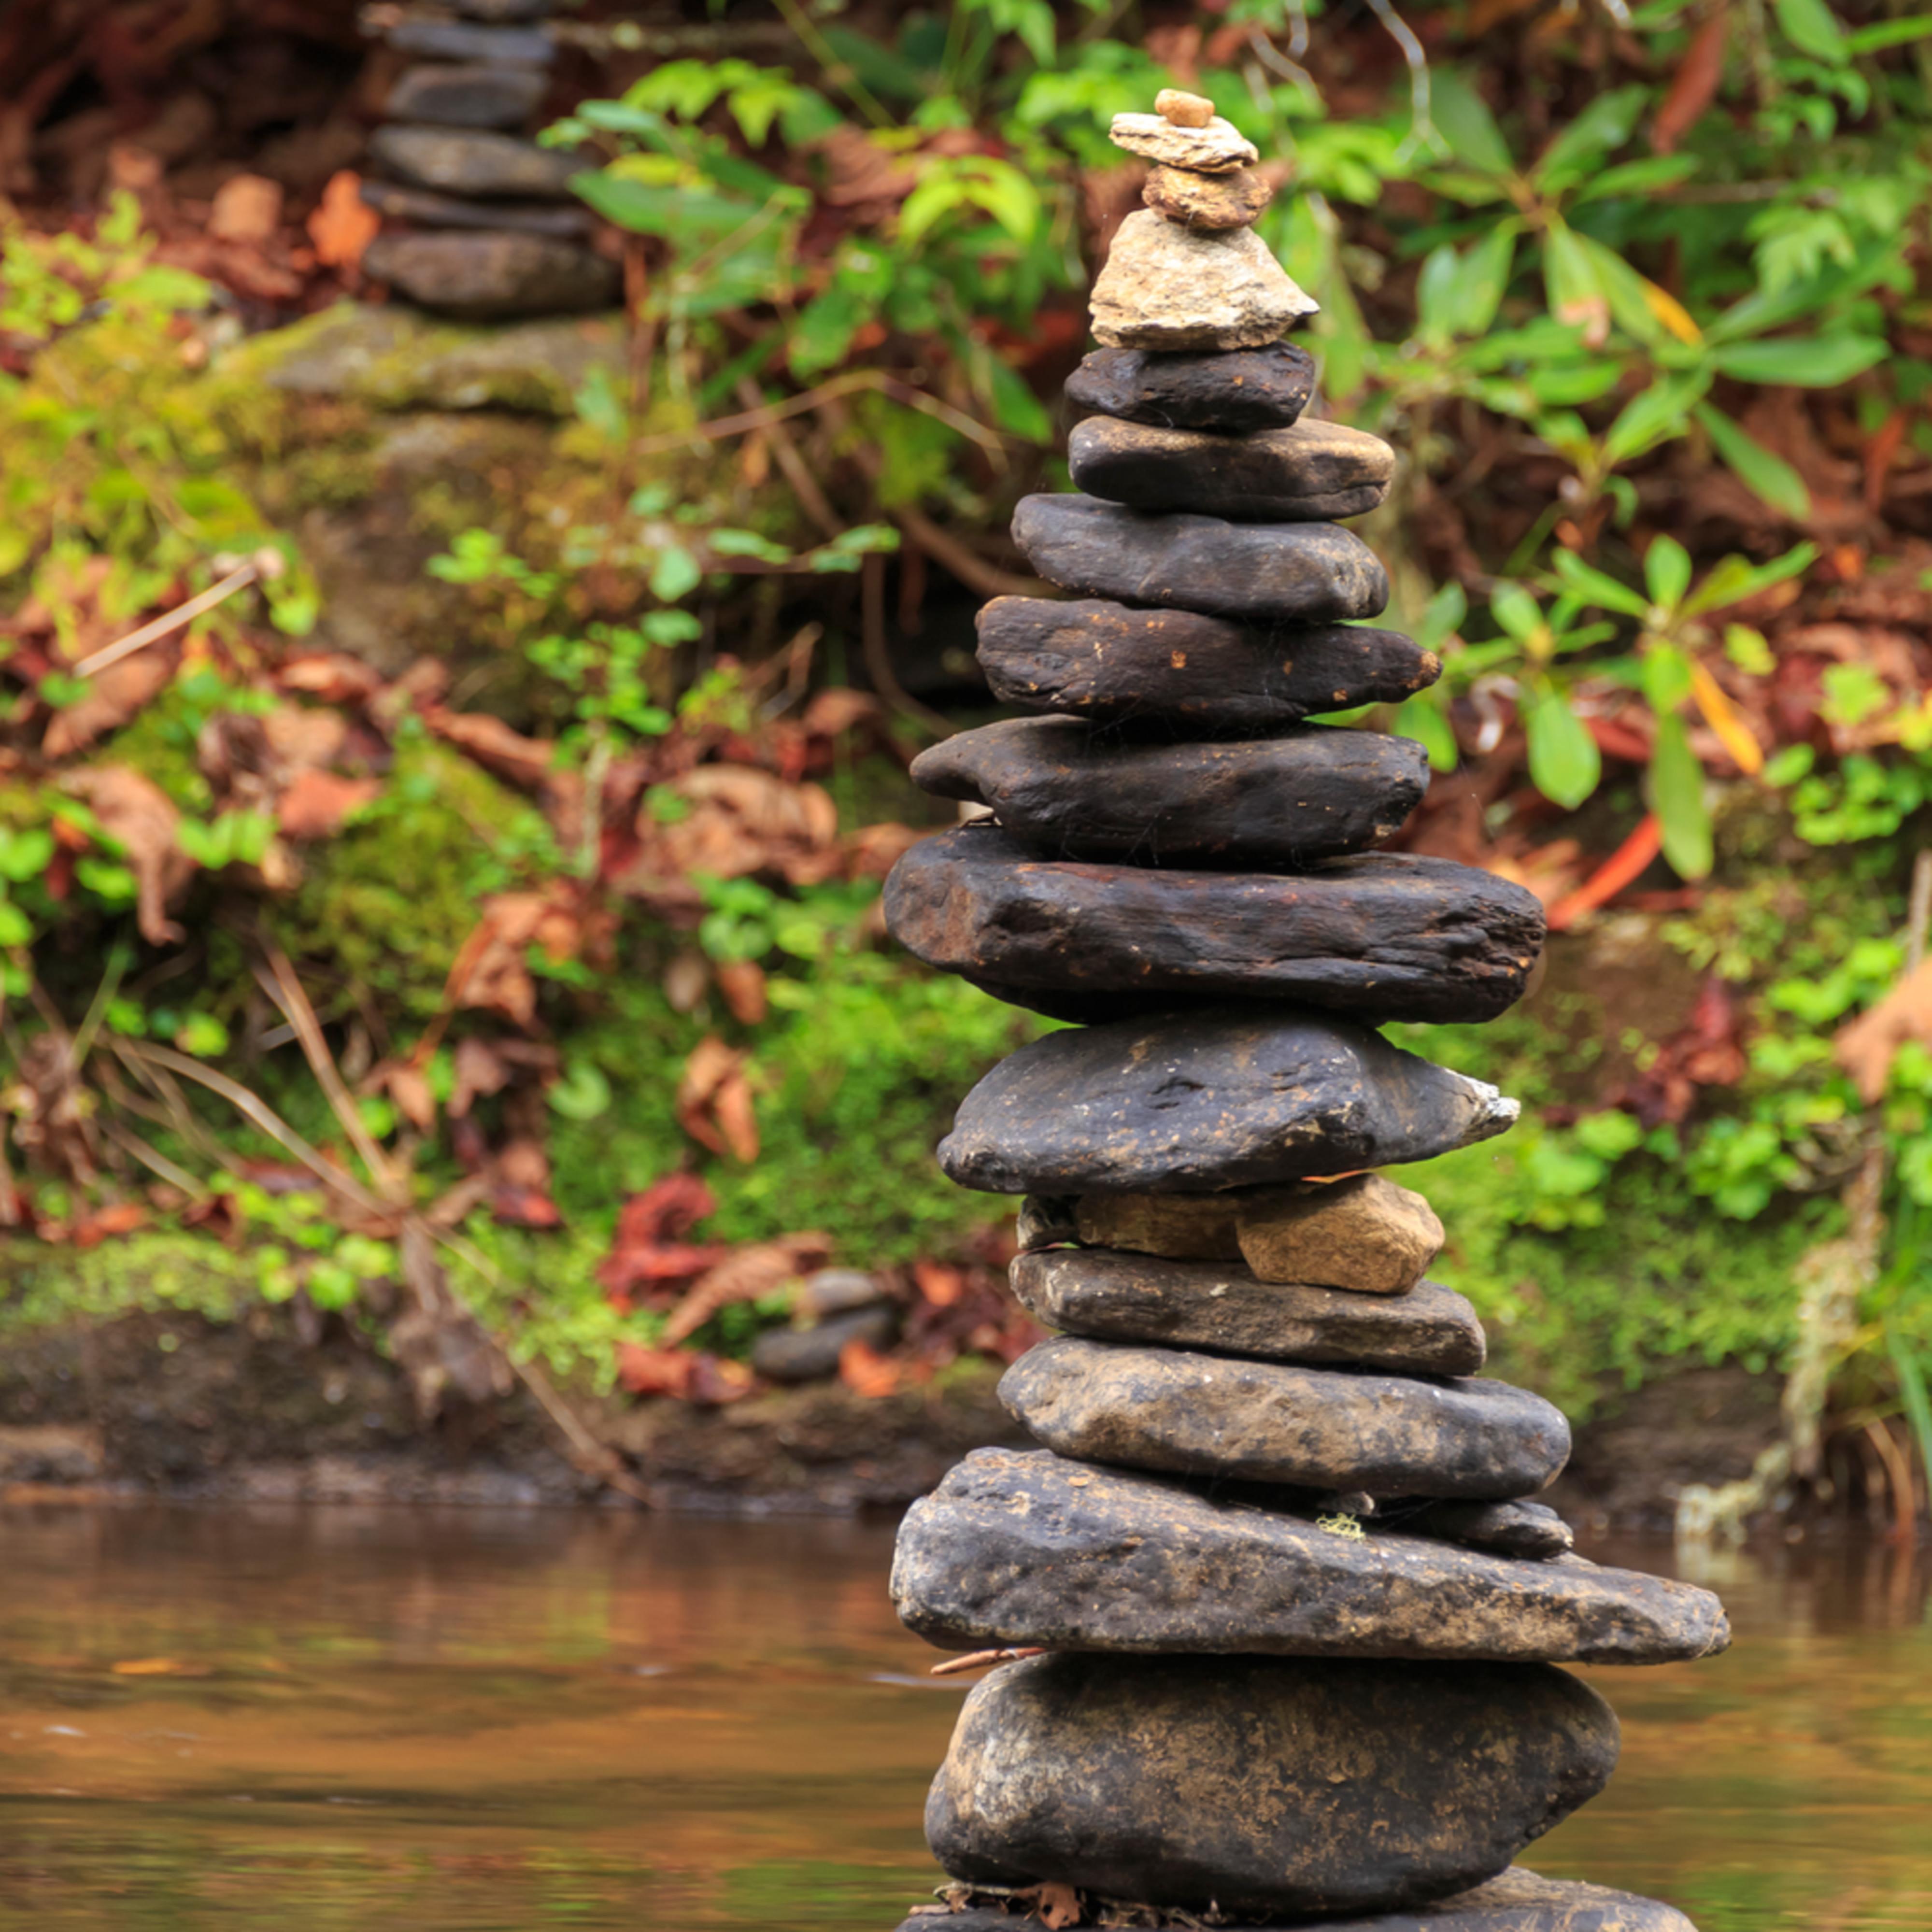 Stone stack filhi7